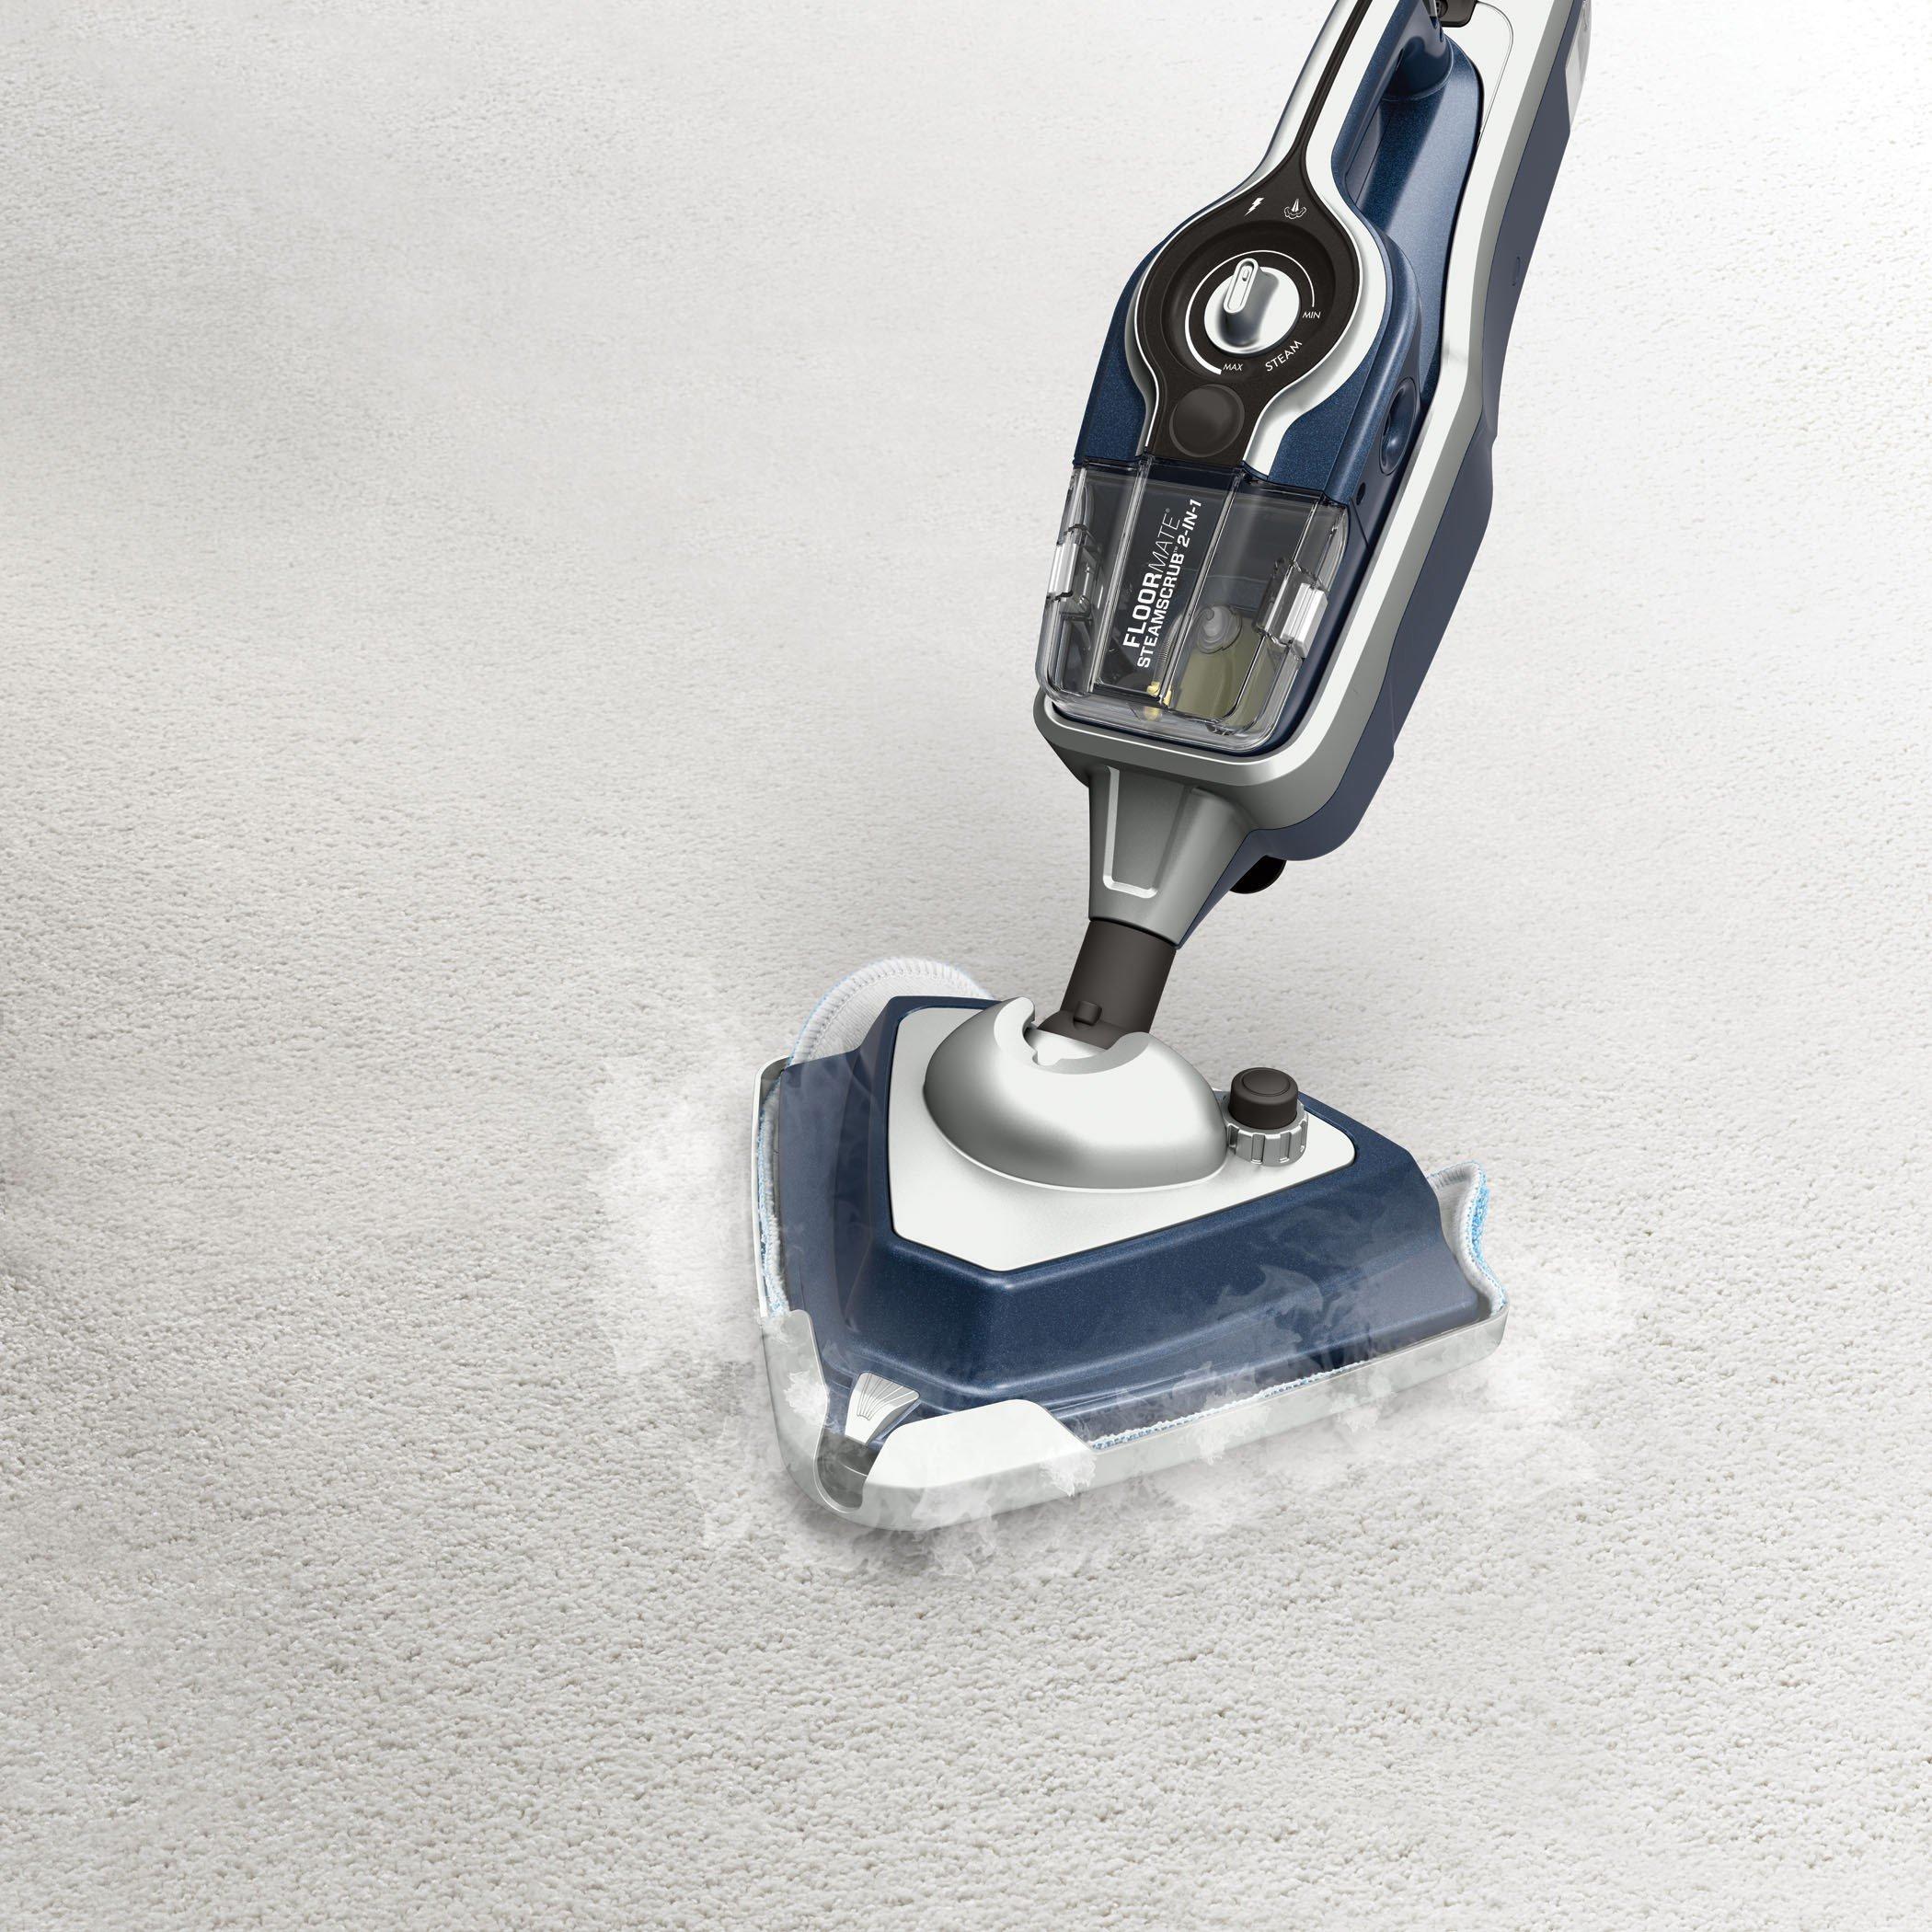 FloorMate SteamScrub Plus 2-in-1 Steam Mop5